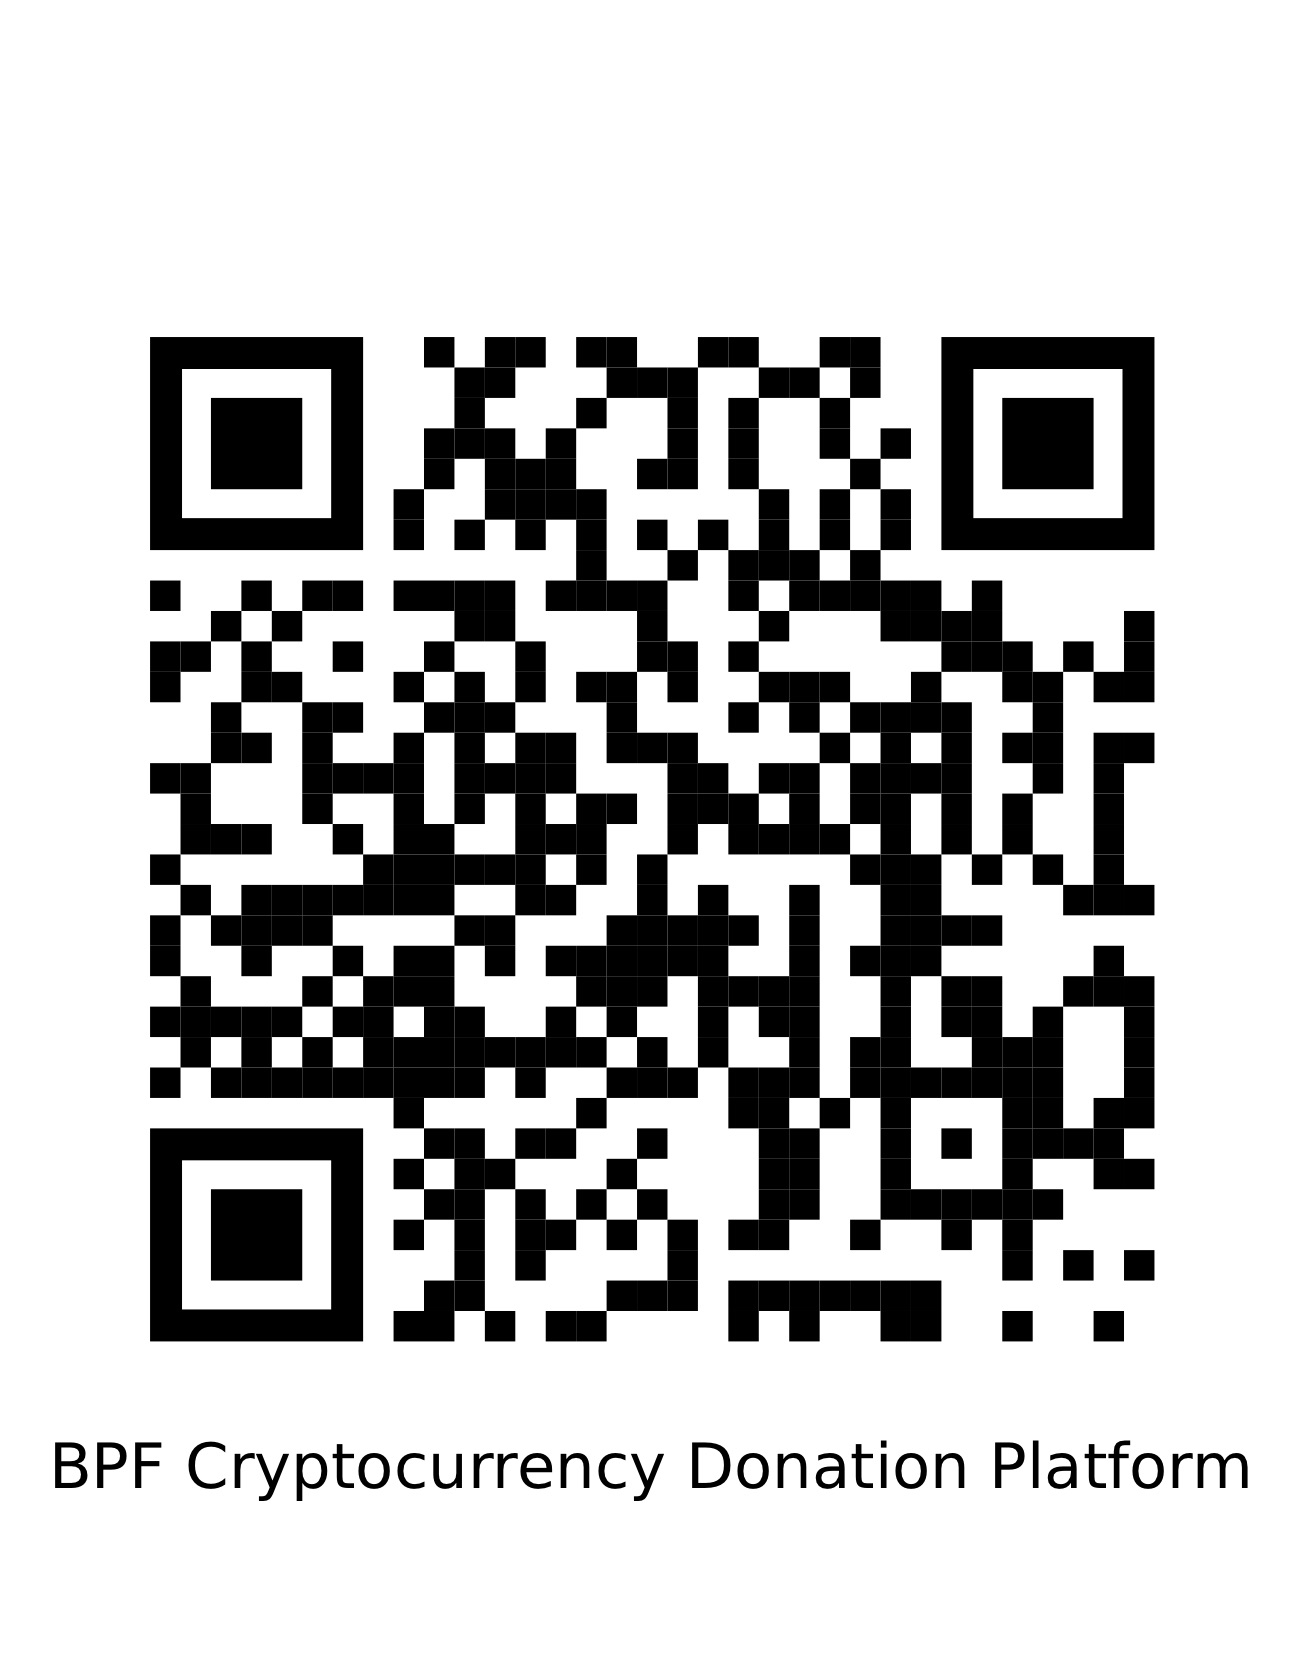 Make a Crypto Donation to BPF